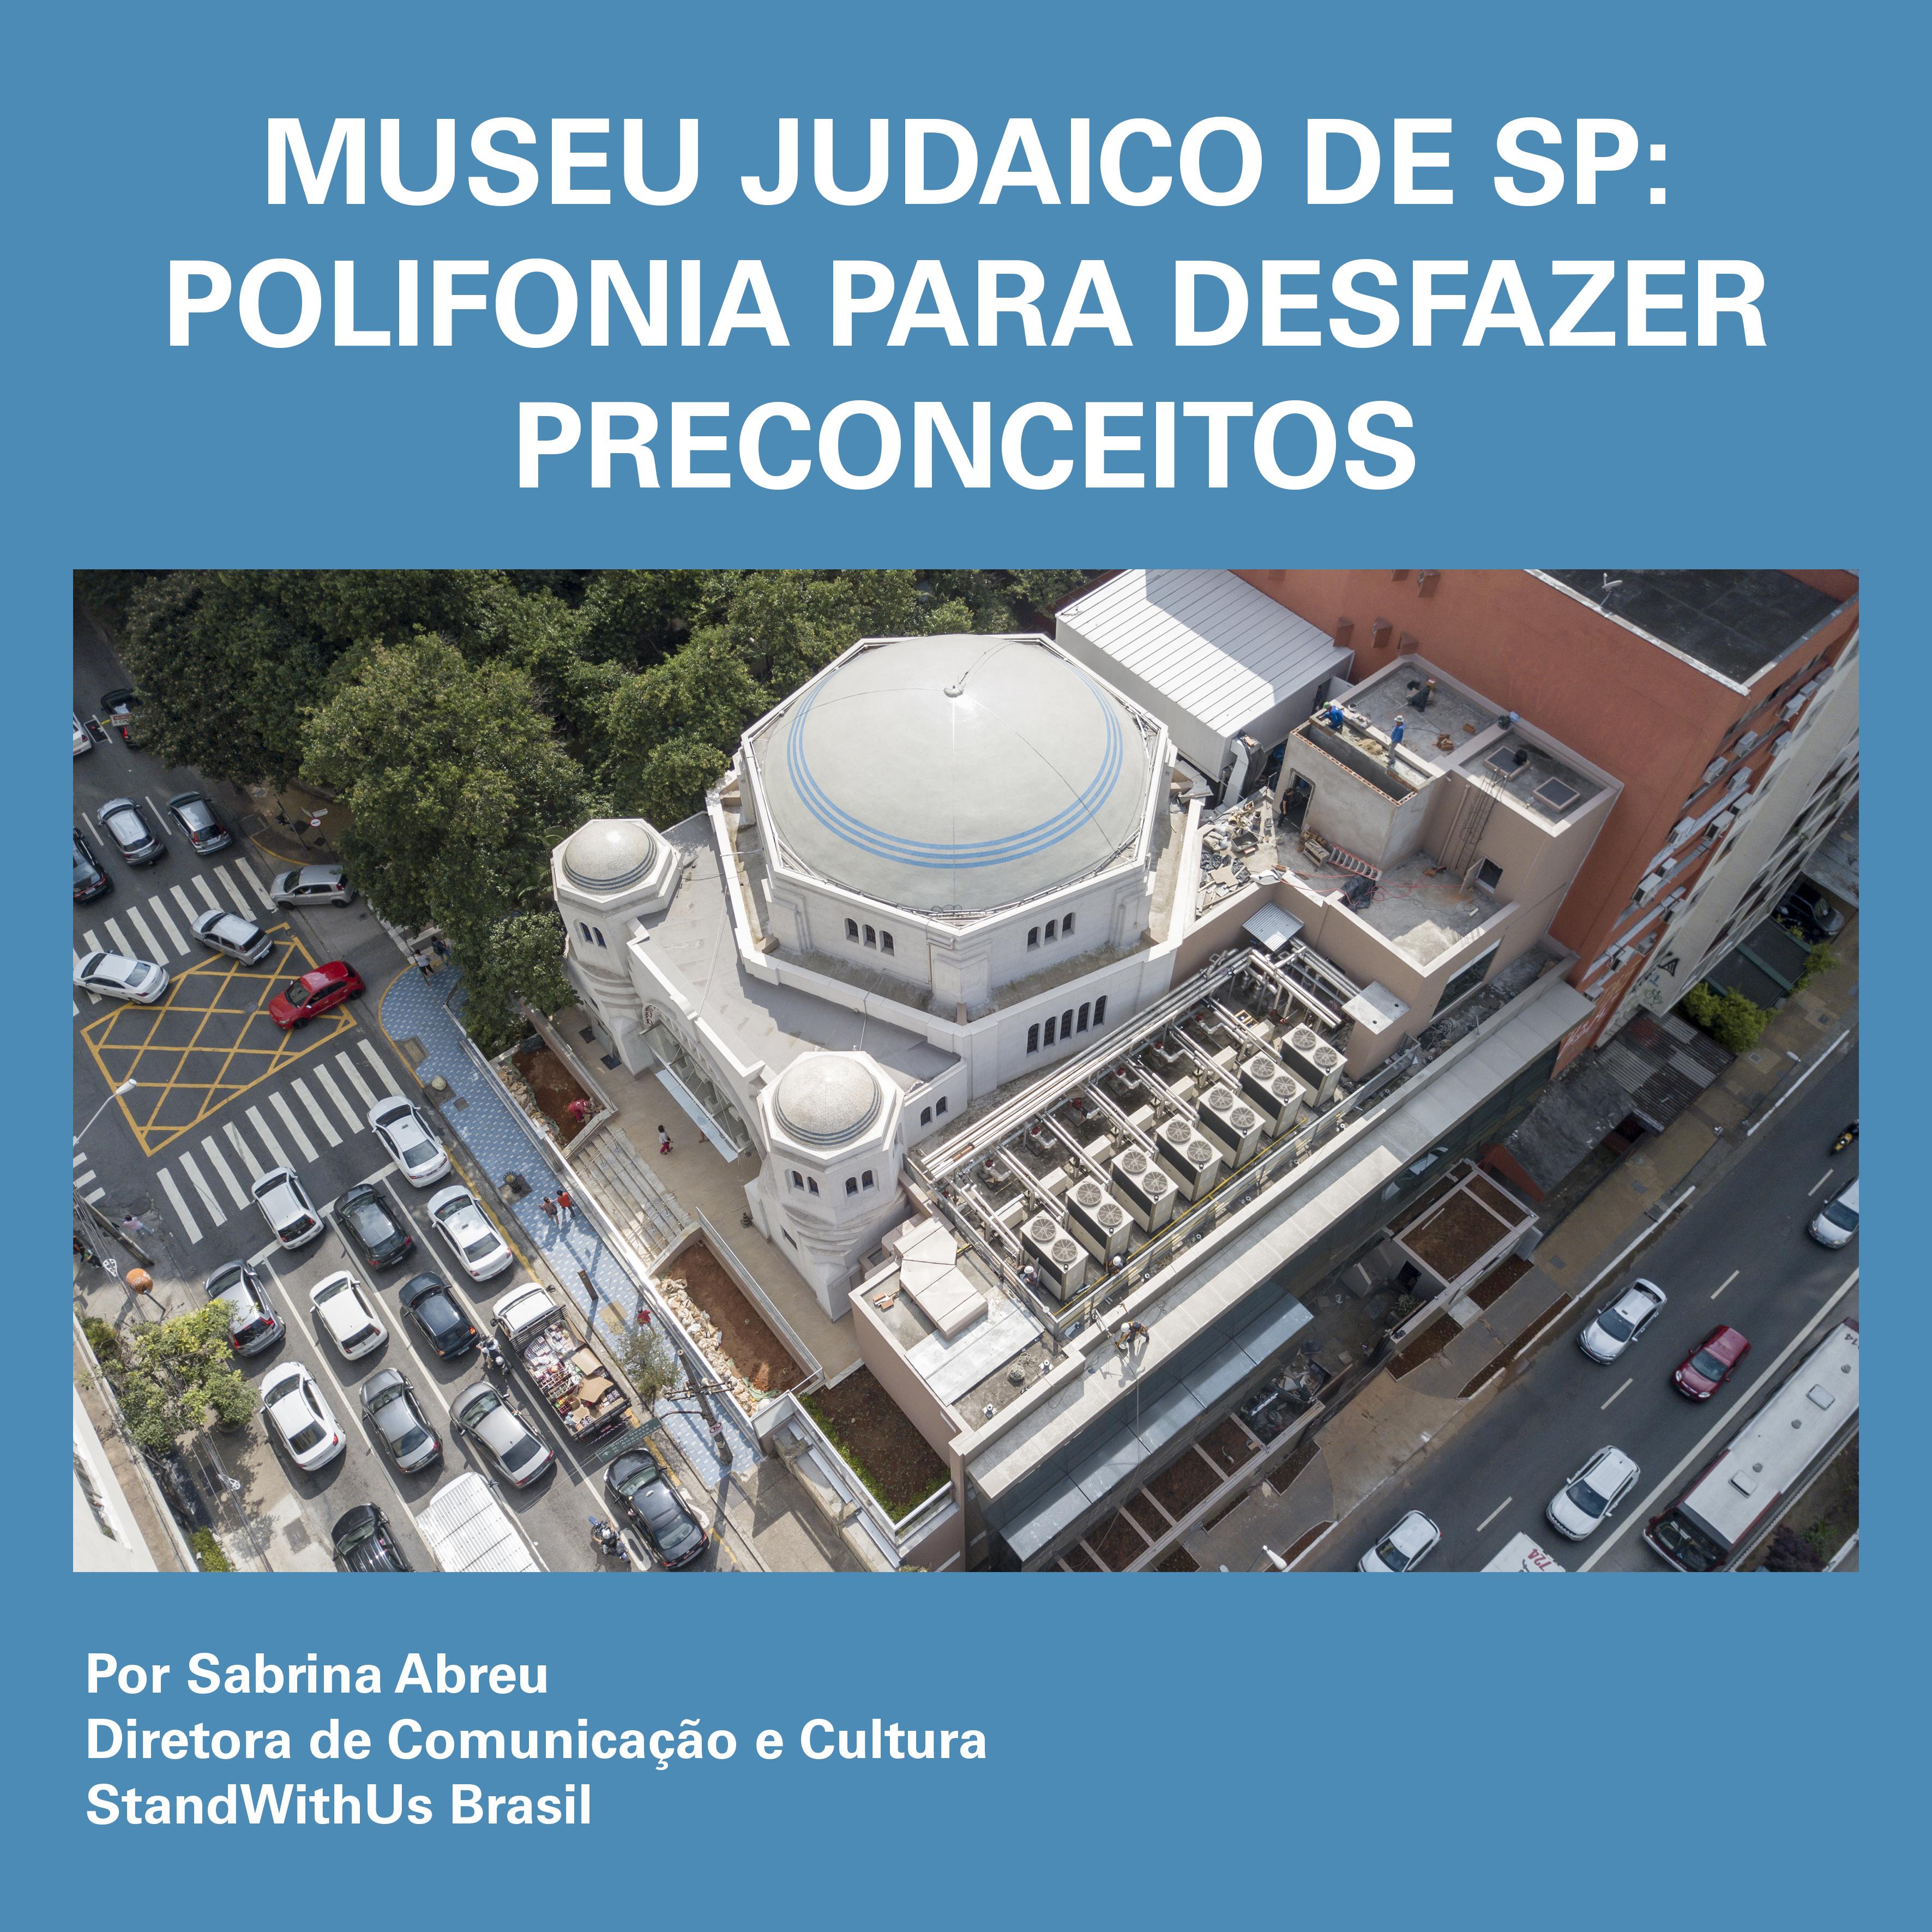 Museu Judaico de SP